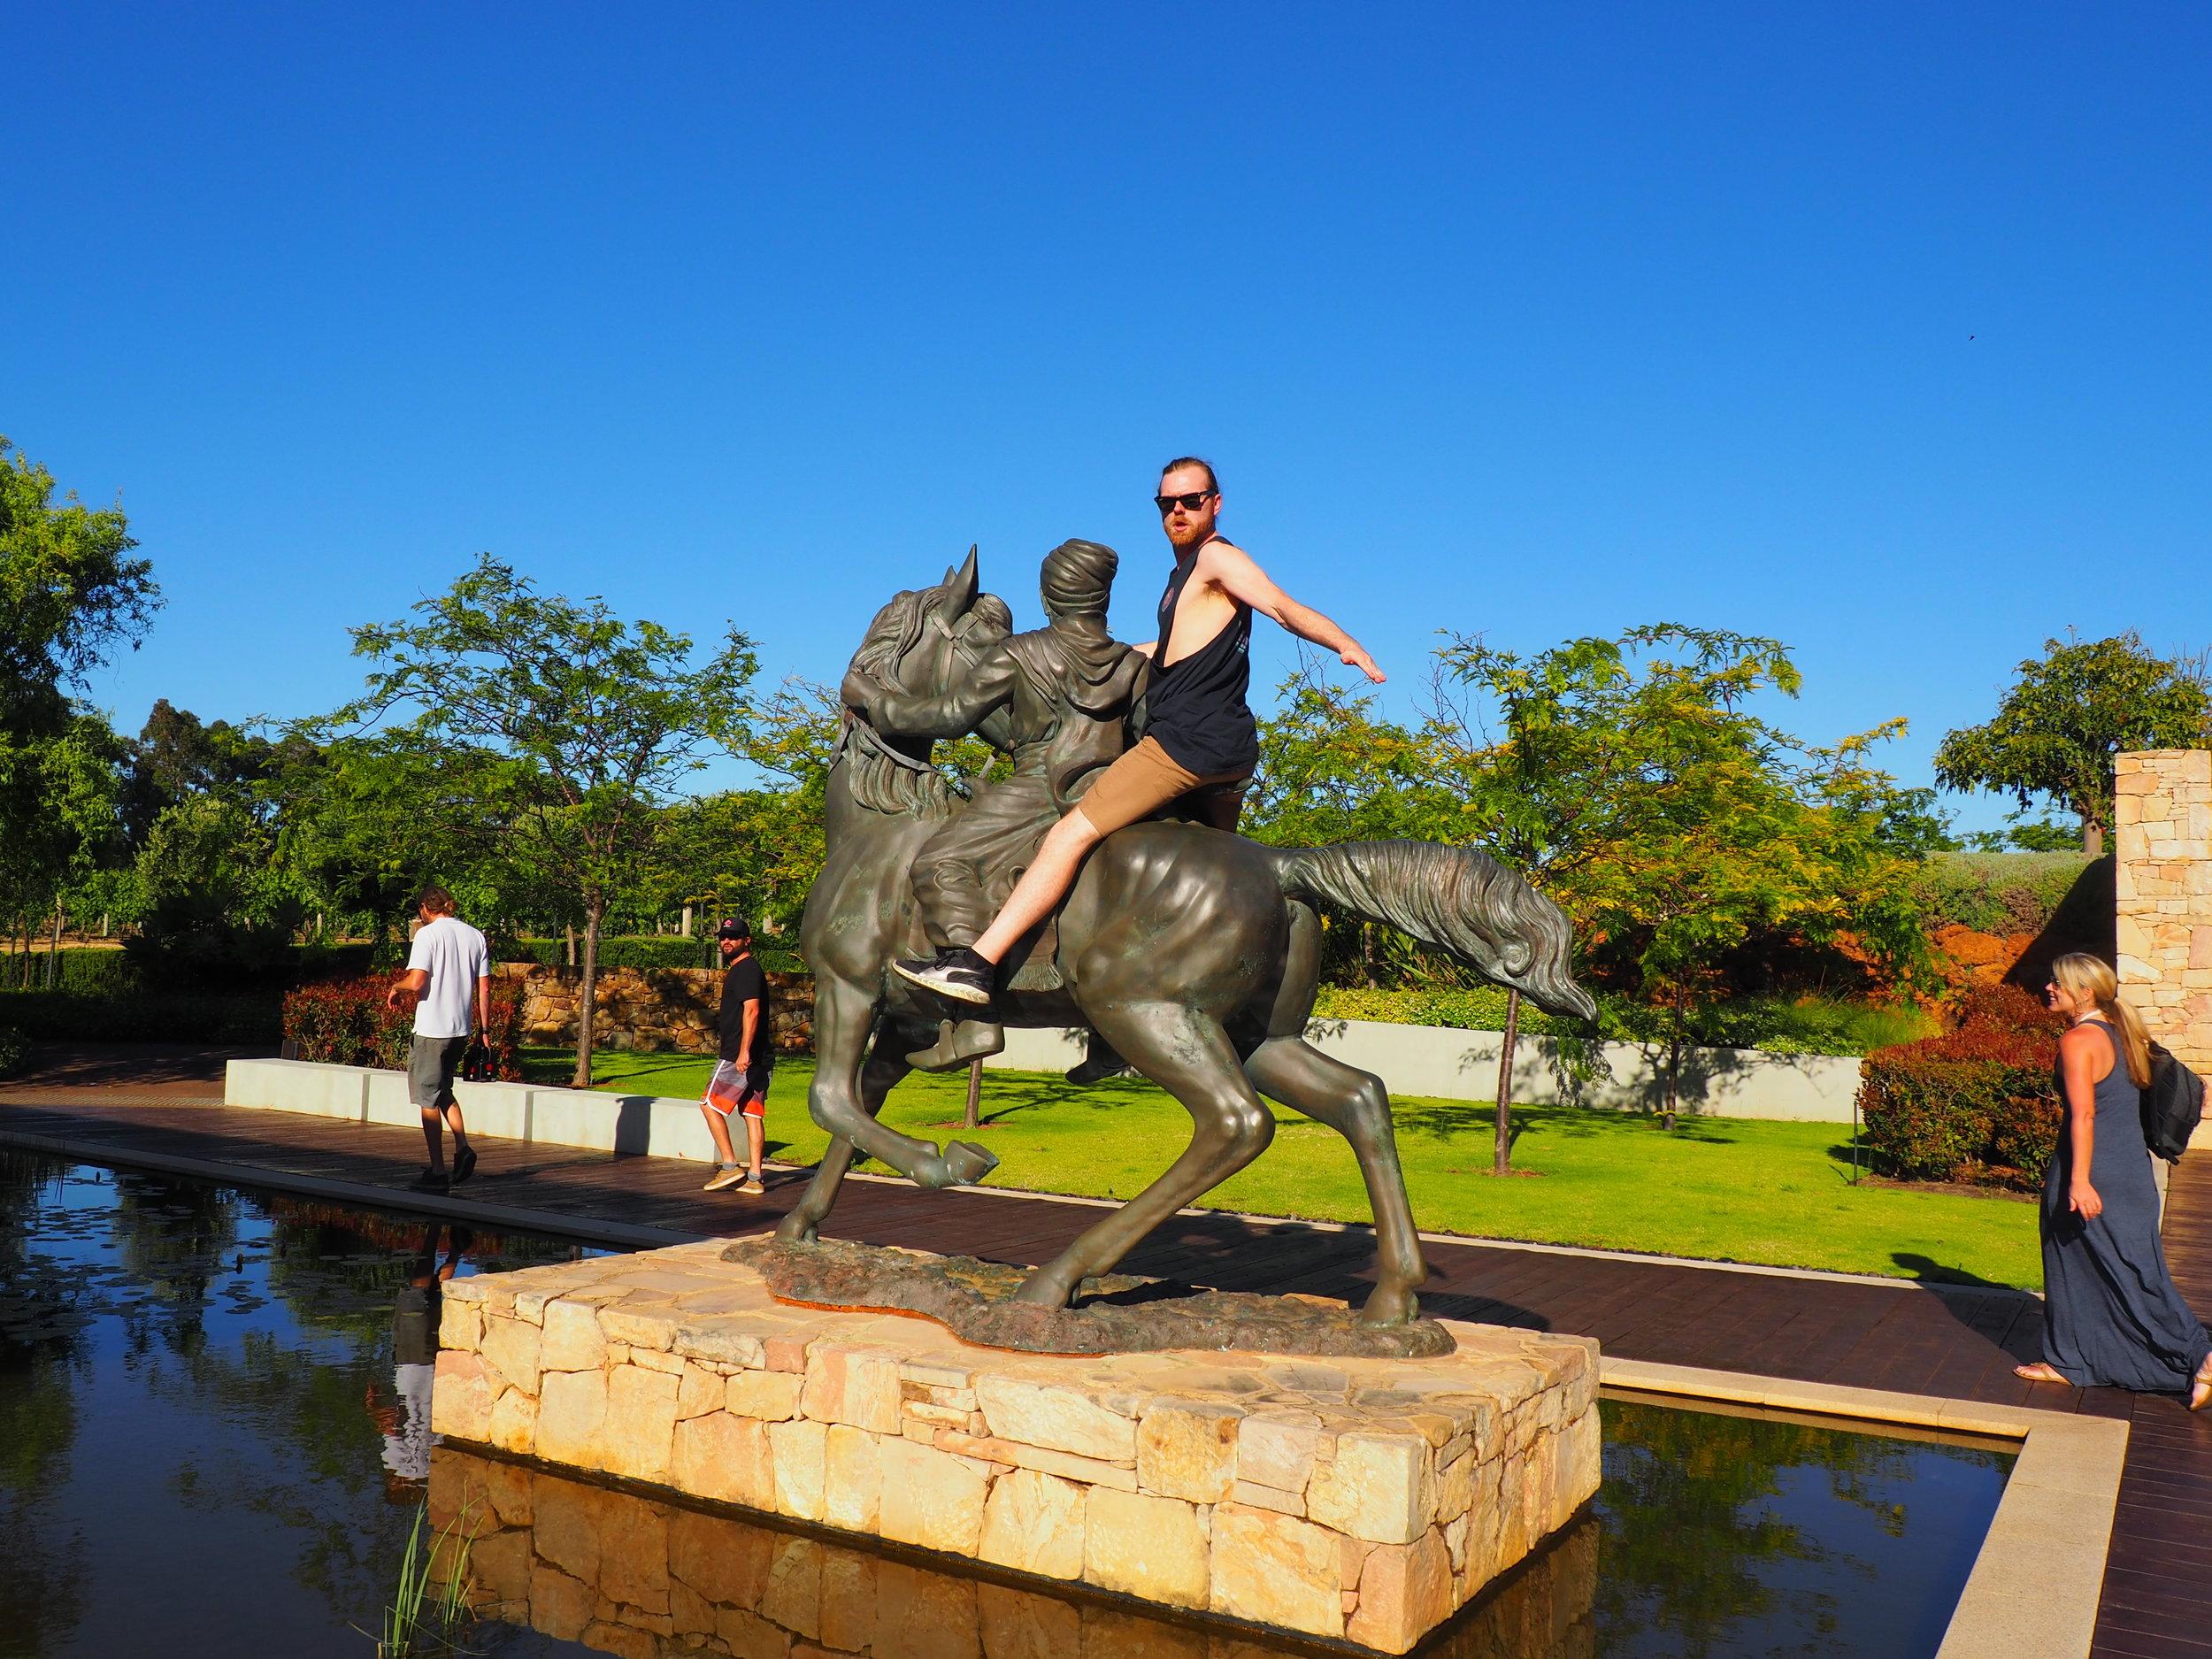 Lawson on the horse.JPG